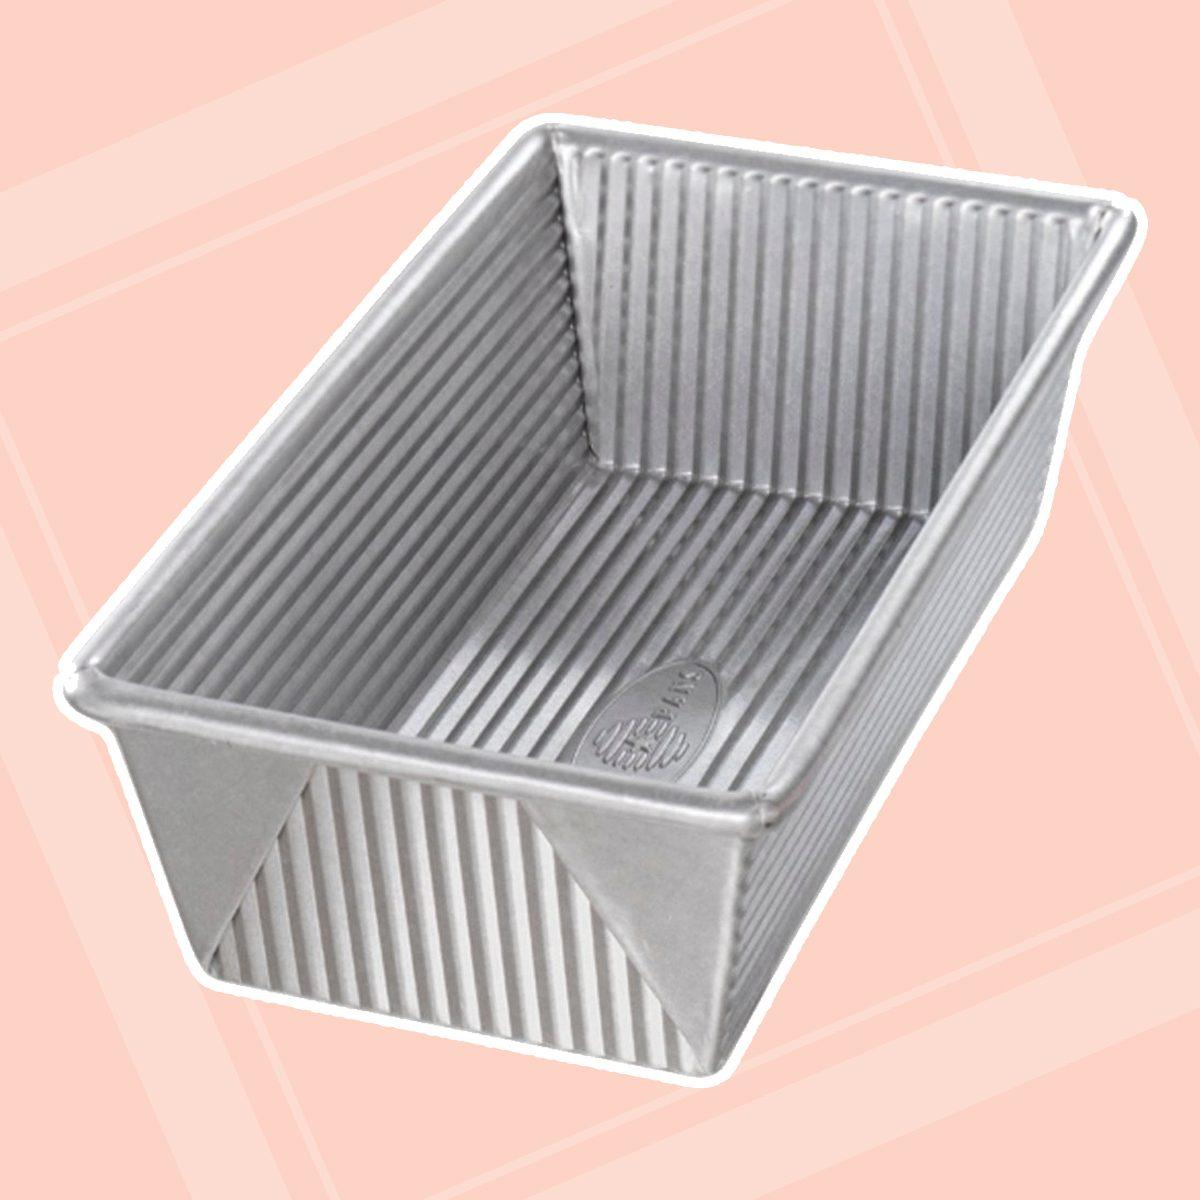 USA Pan 1145LF Bakeware Aluminized Steel 1 1/4 Pound Loaf Pan, Medium, Silver